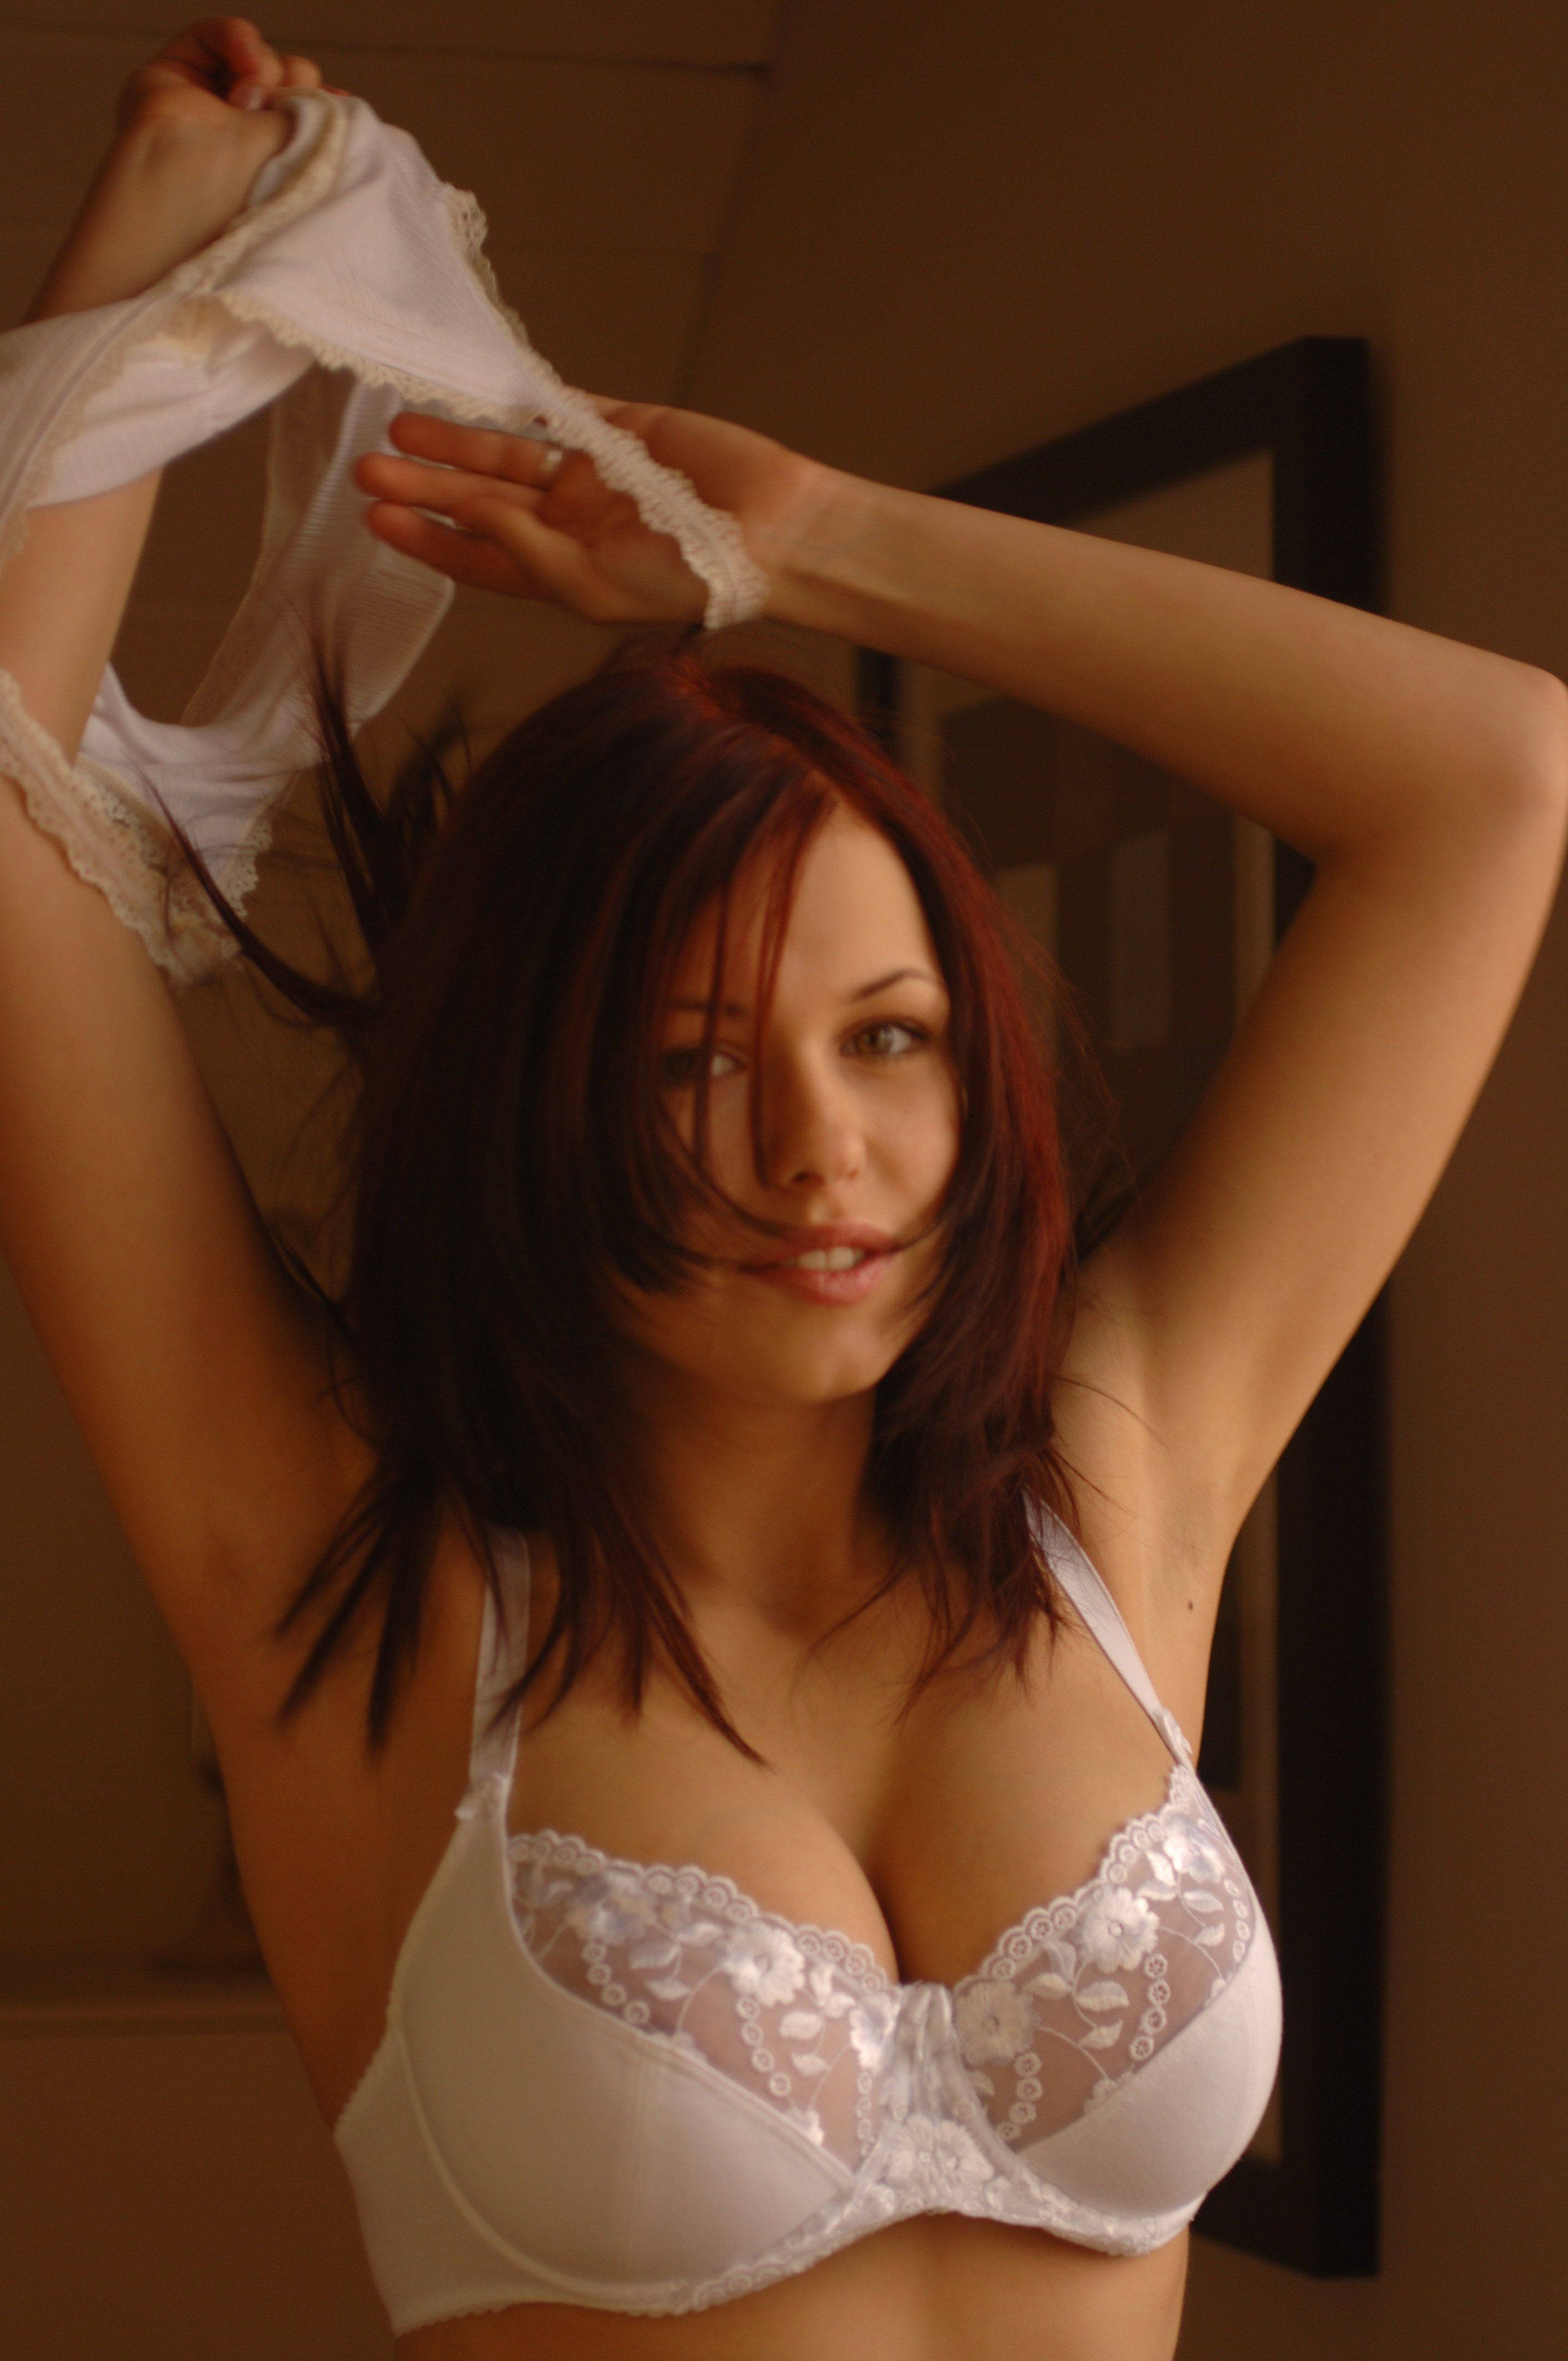 Naked woman big breast